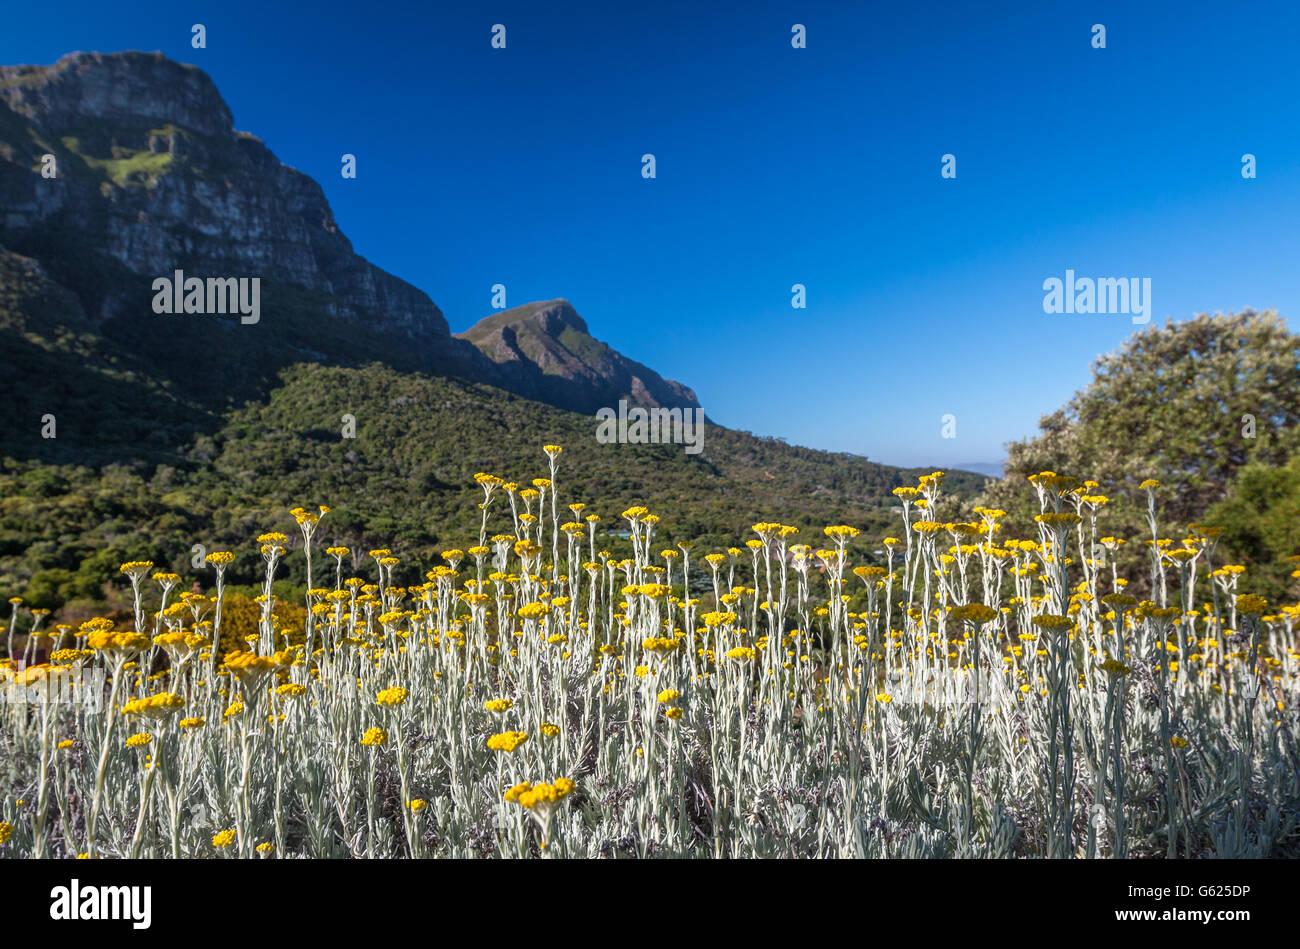 Kirtenbosch park in South Africa Cape town - Stock Image